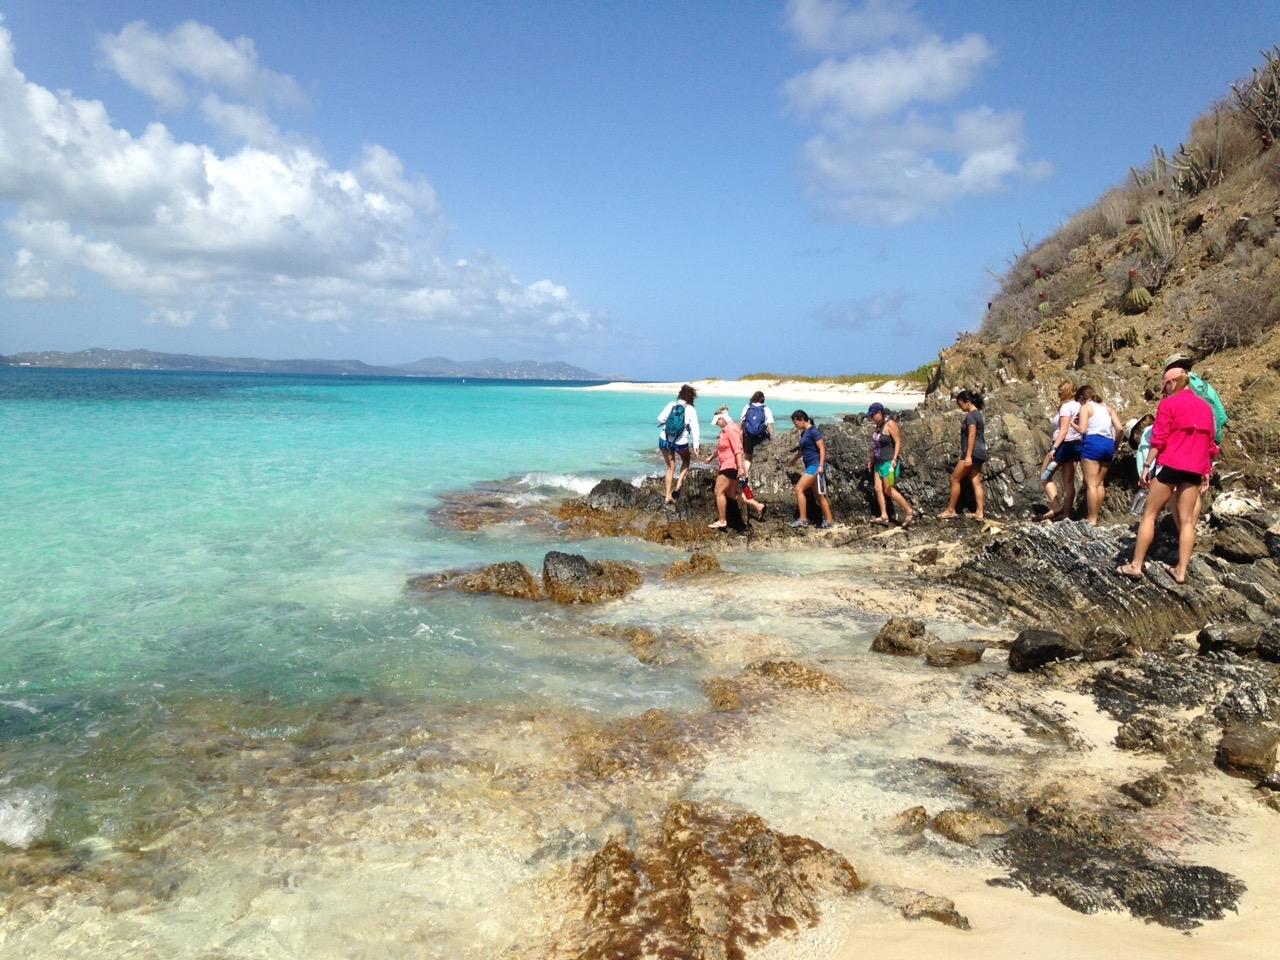 St Croix Buck Island Reef National Monument Sea Turtles